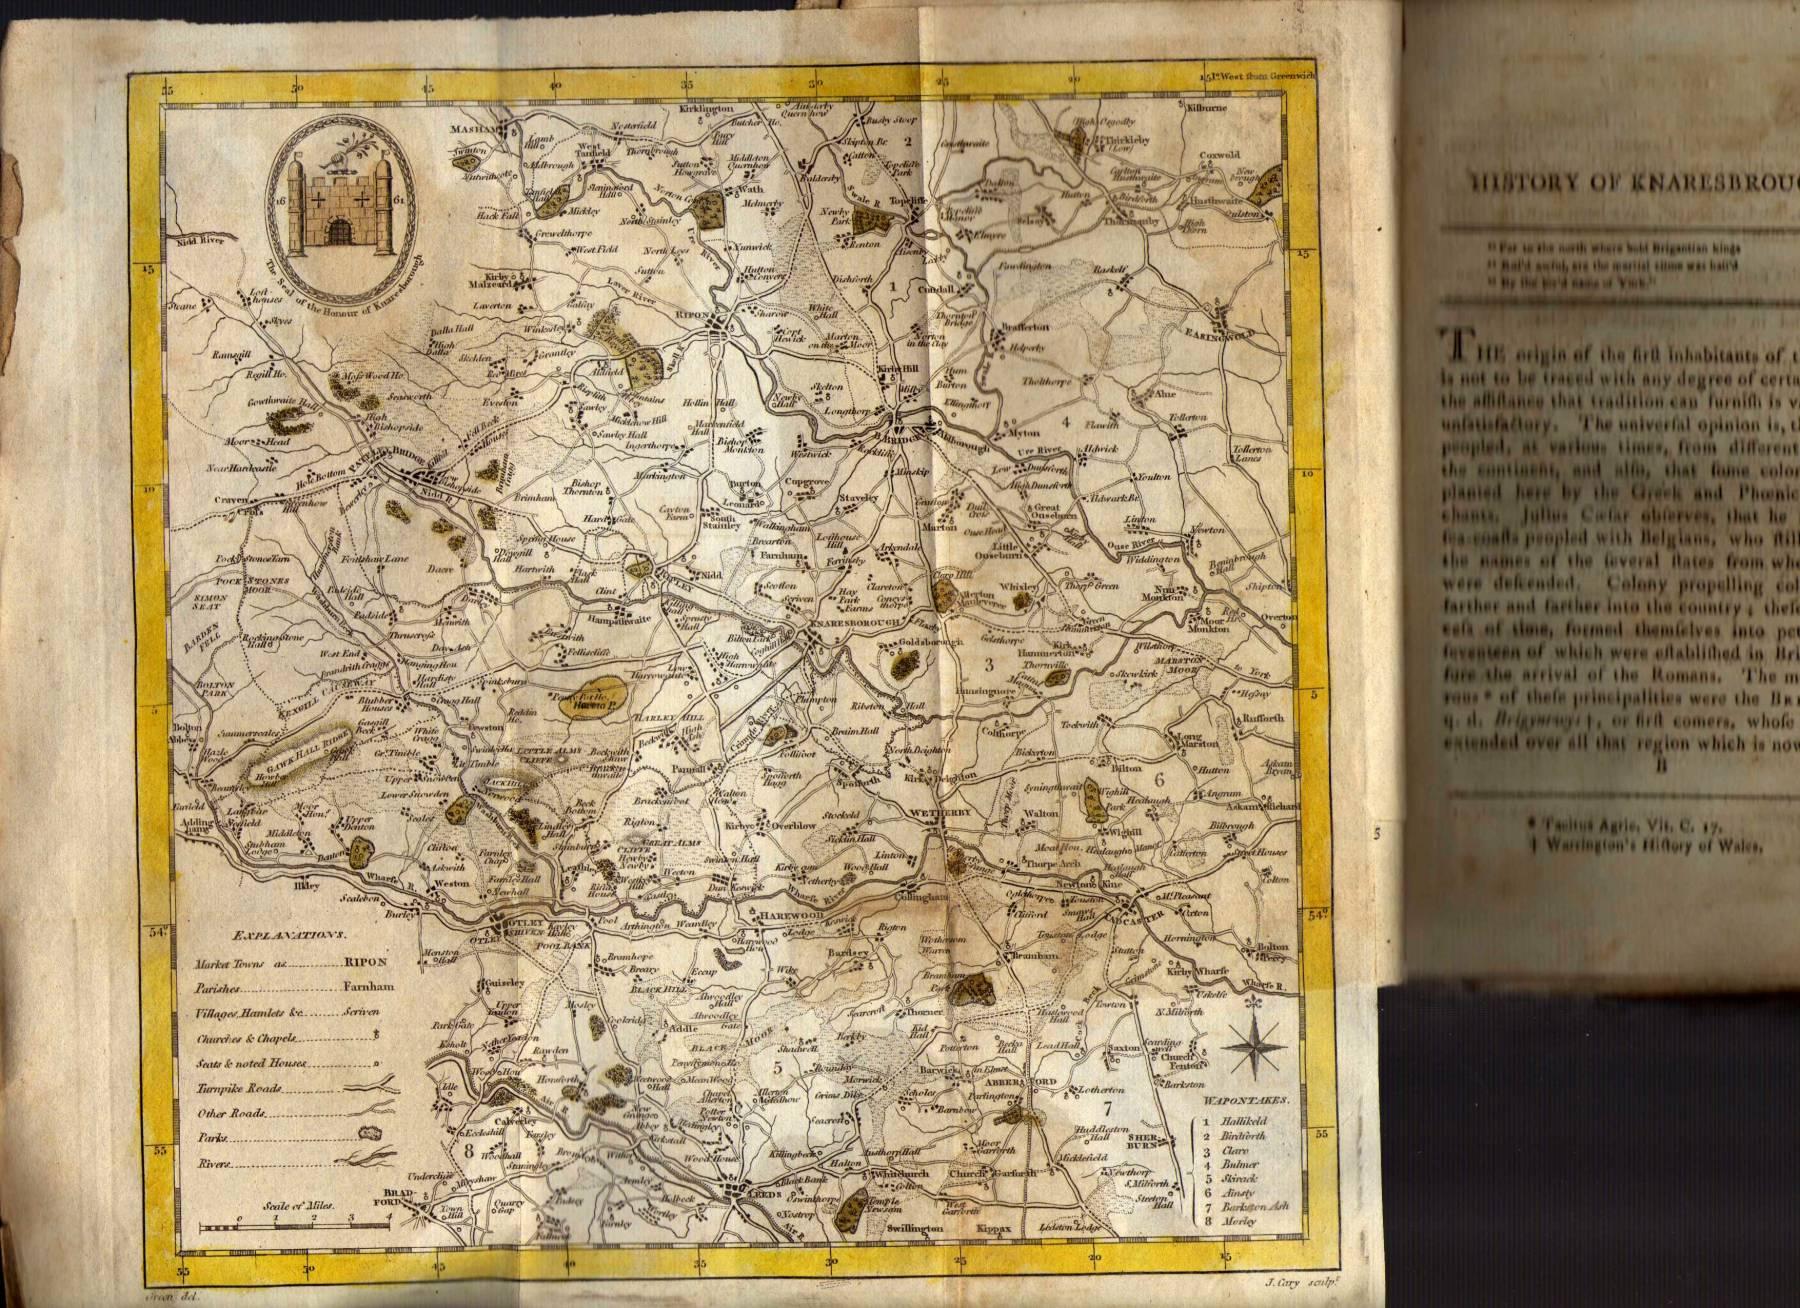 History of Knaresborough